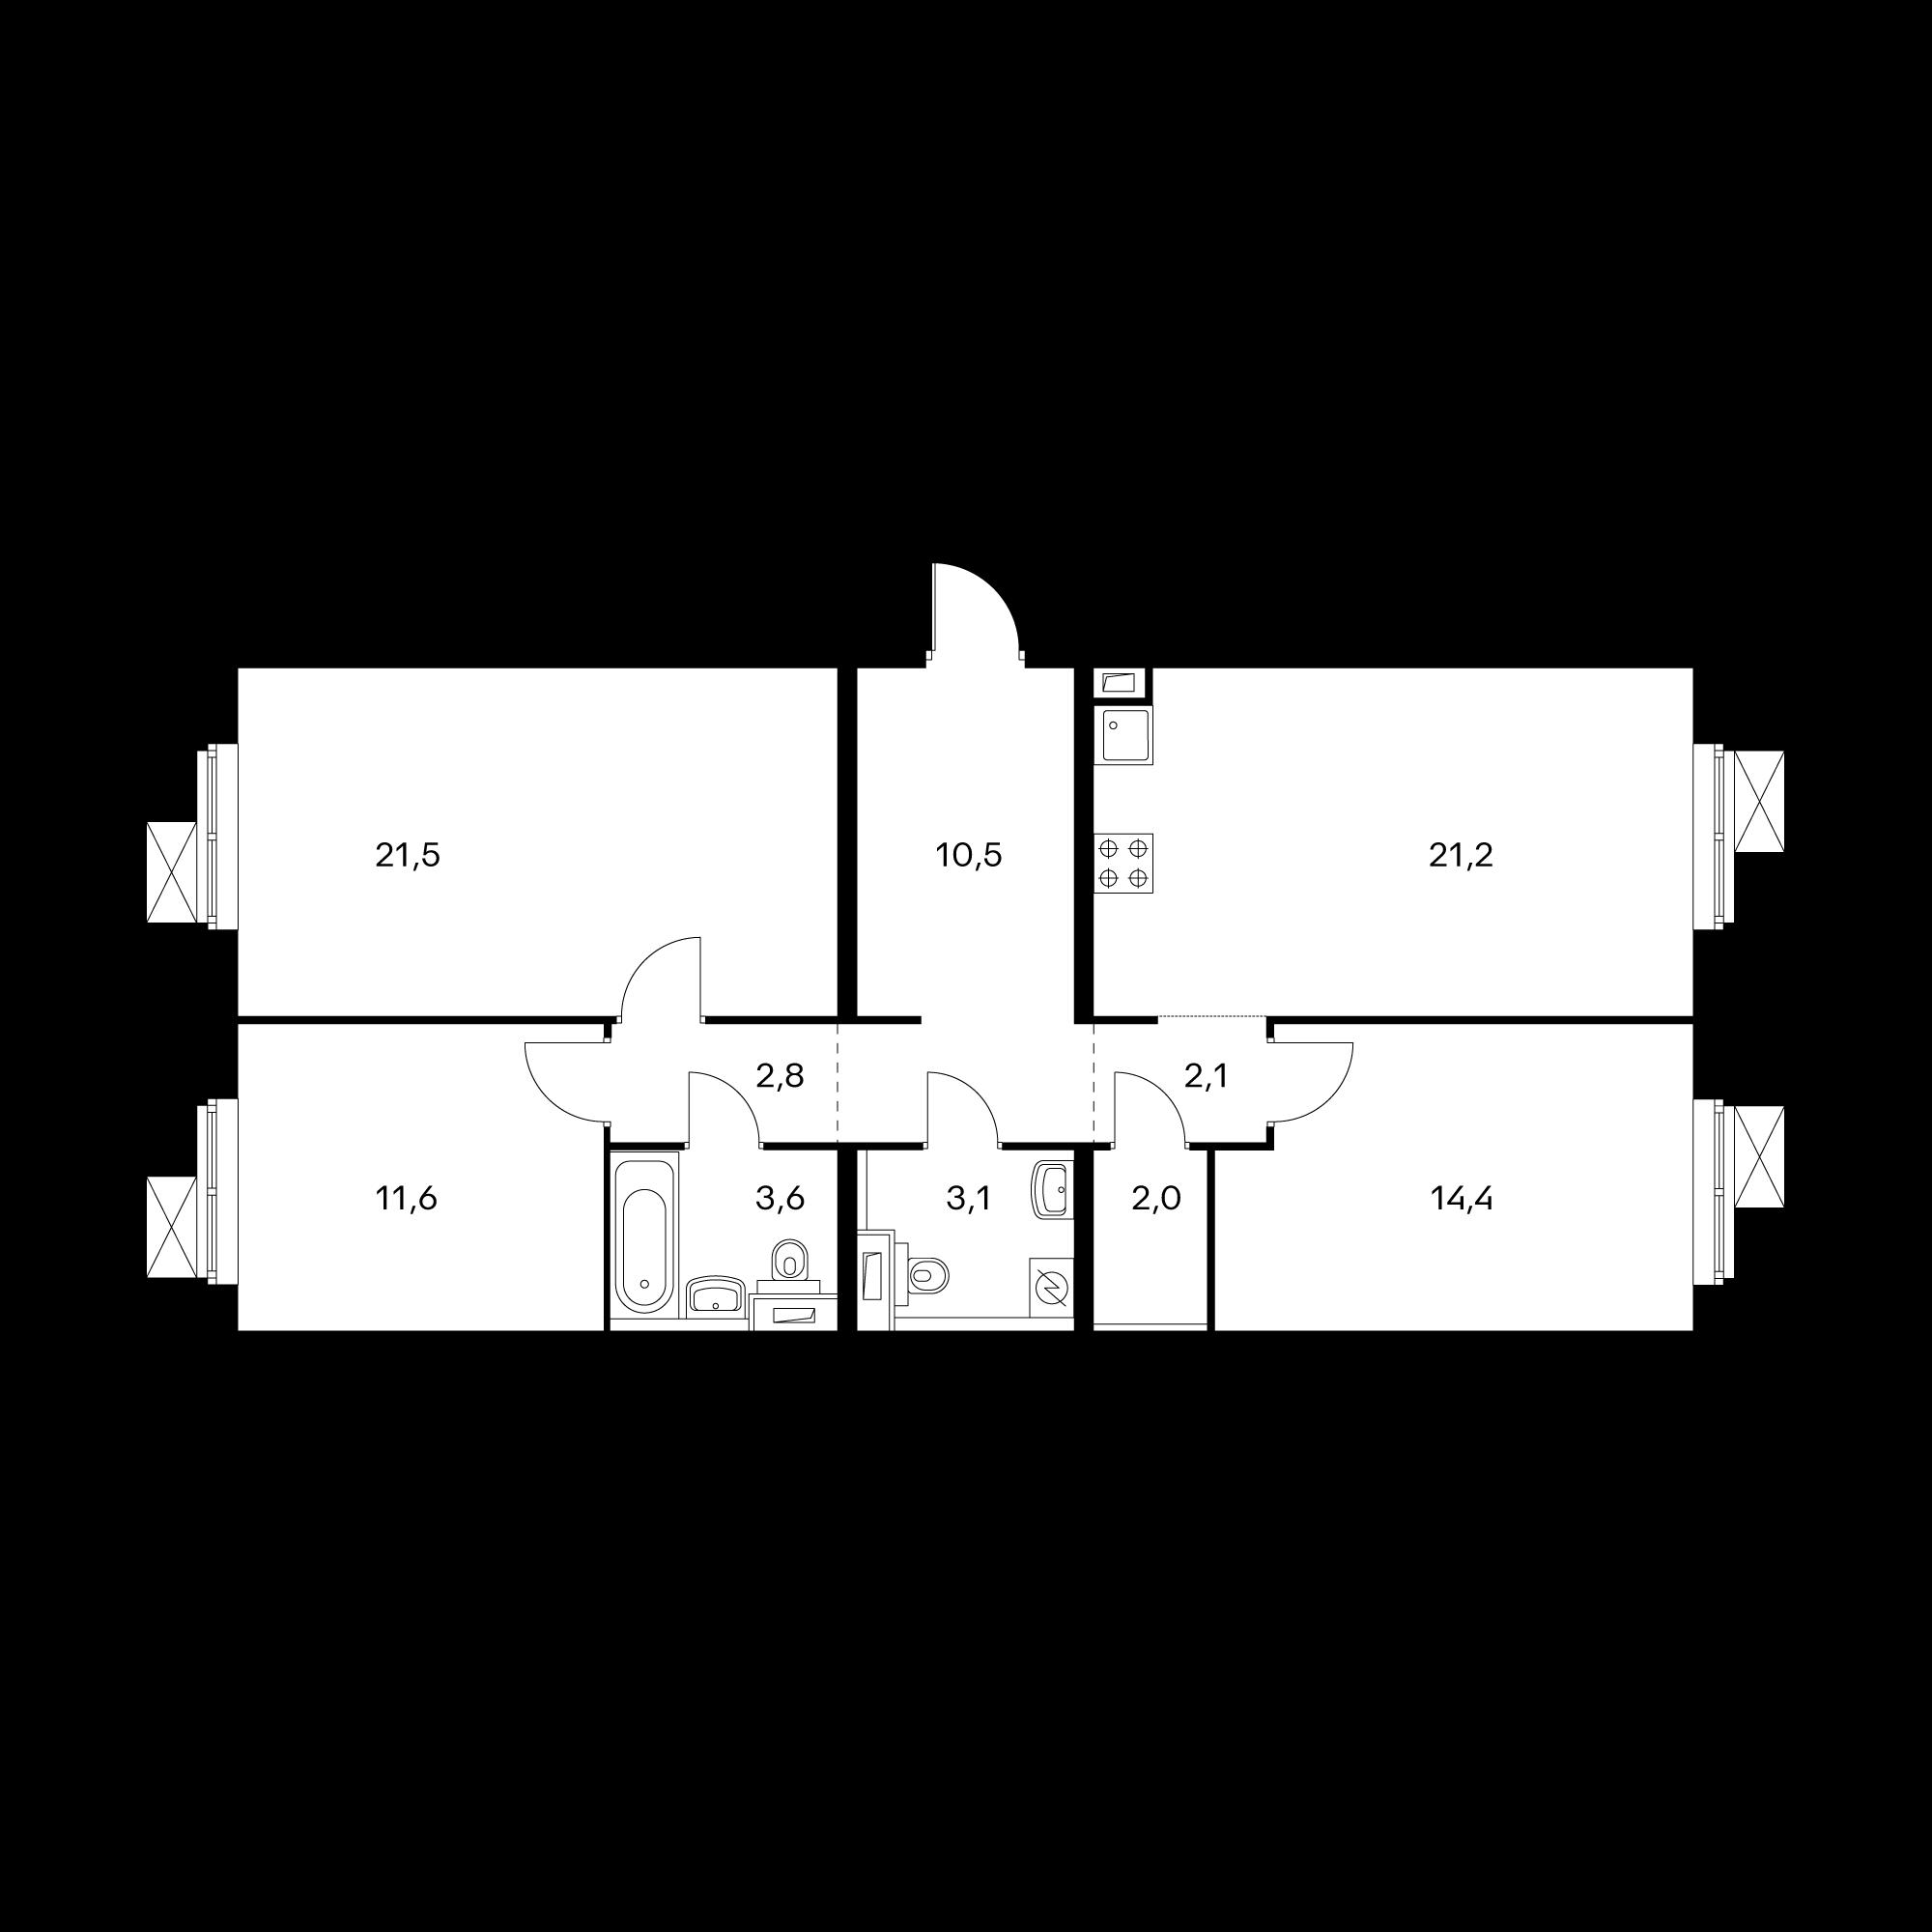 3EL11_6.9-1